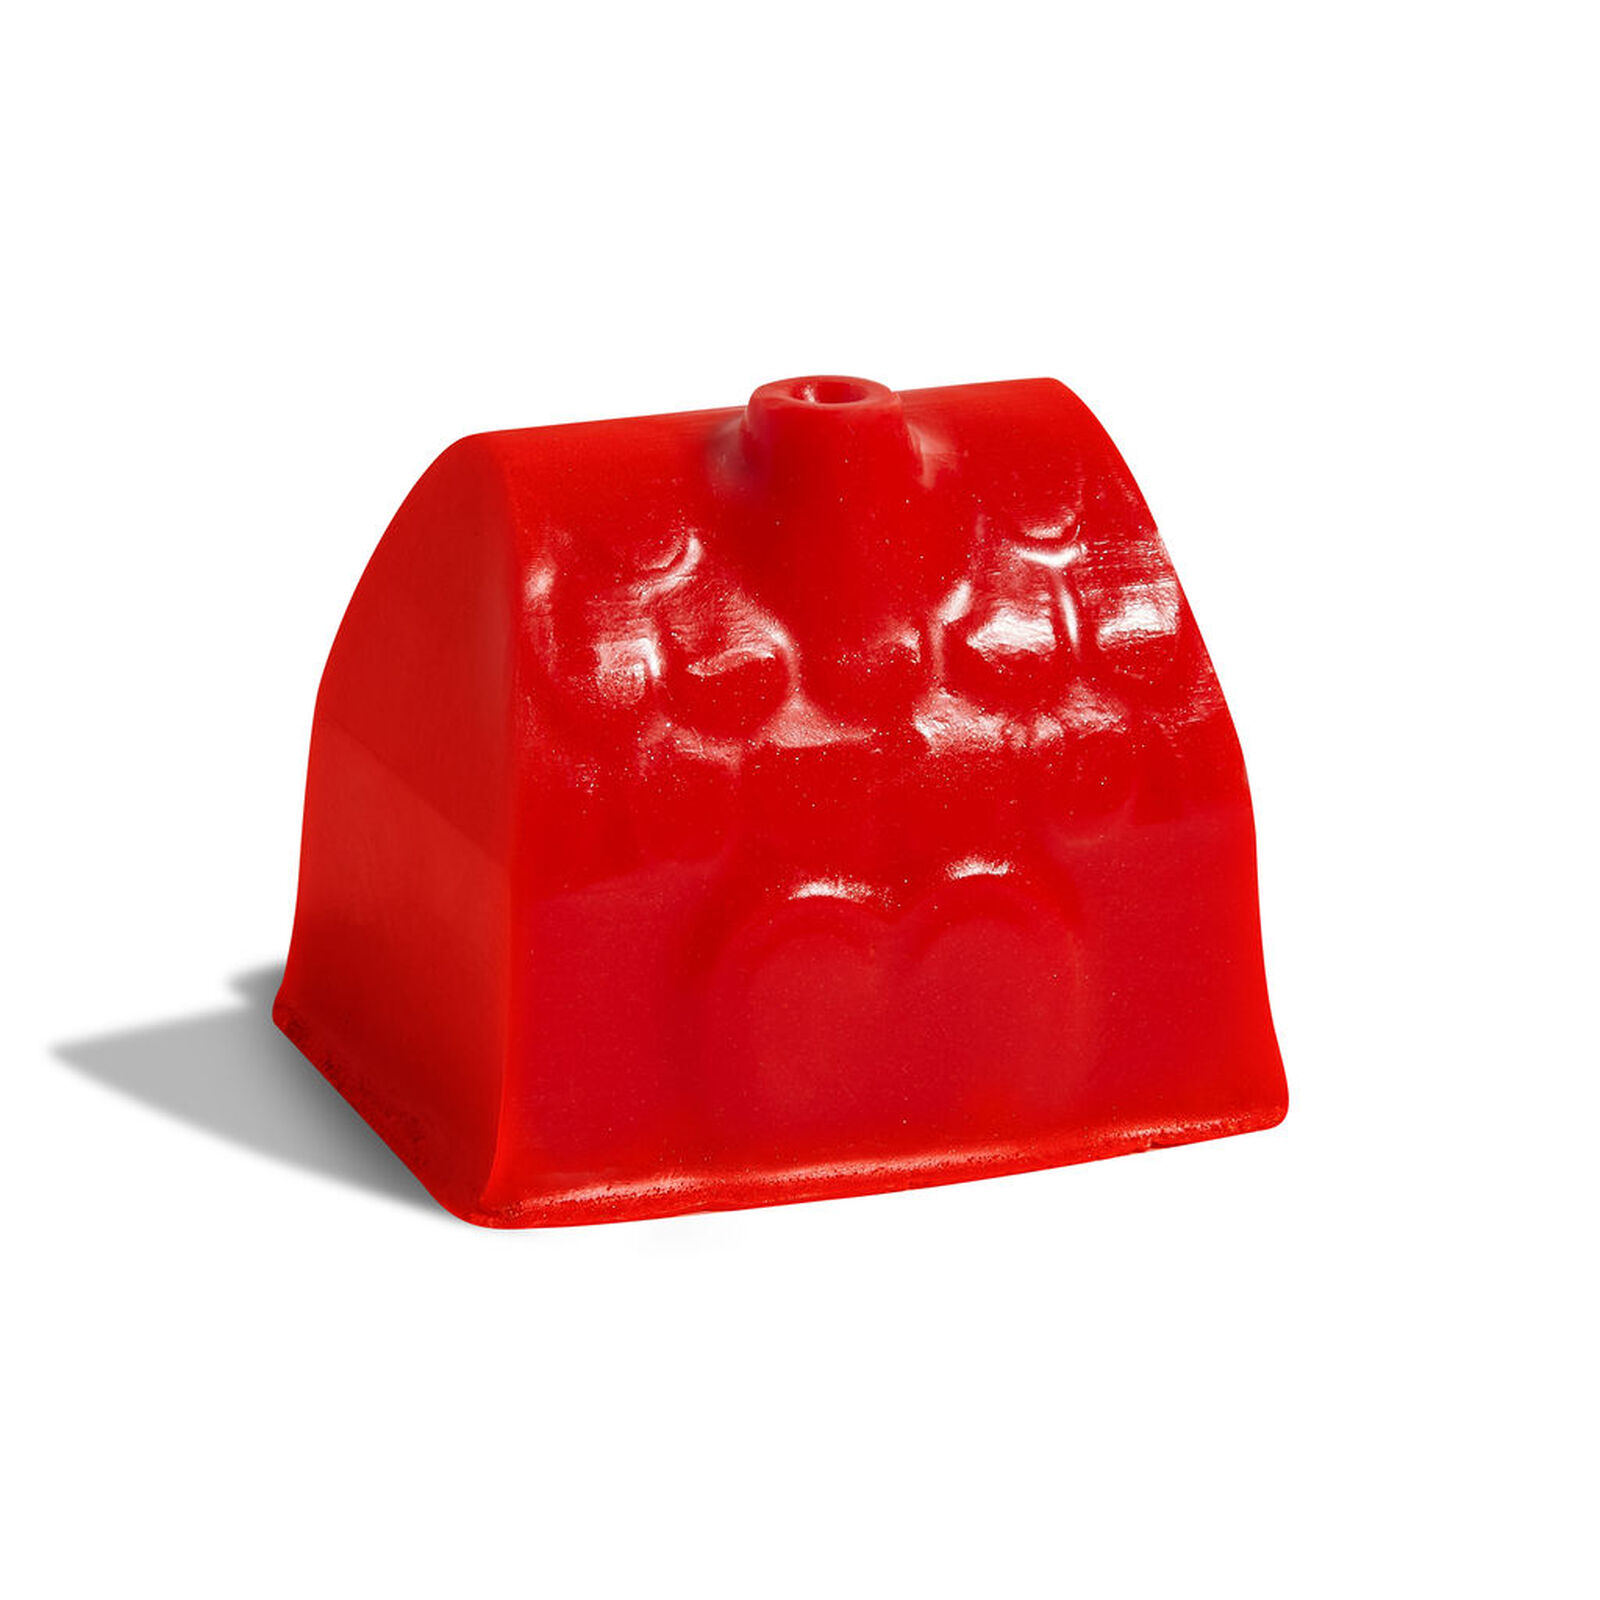 Lush Mi Casa Es Tu Casa Soap